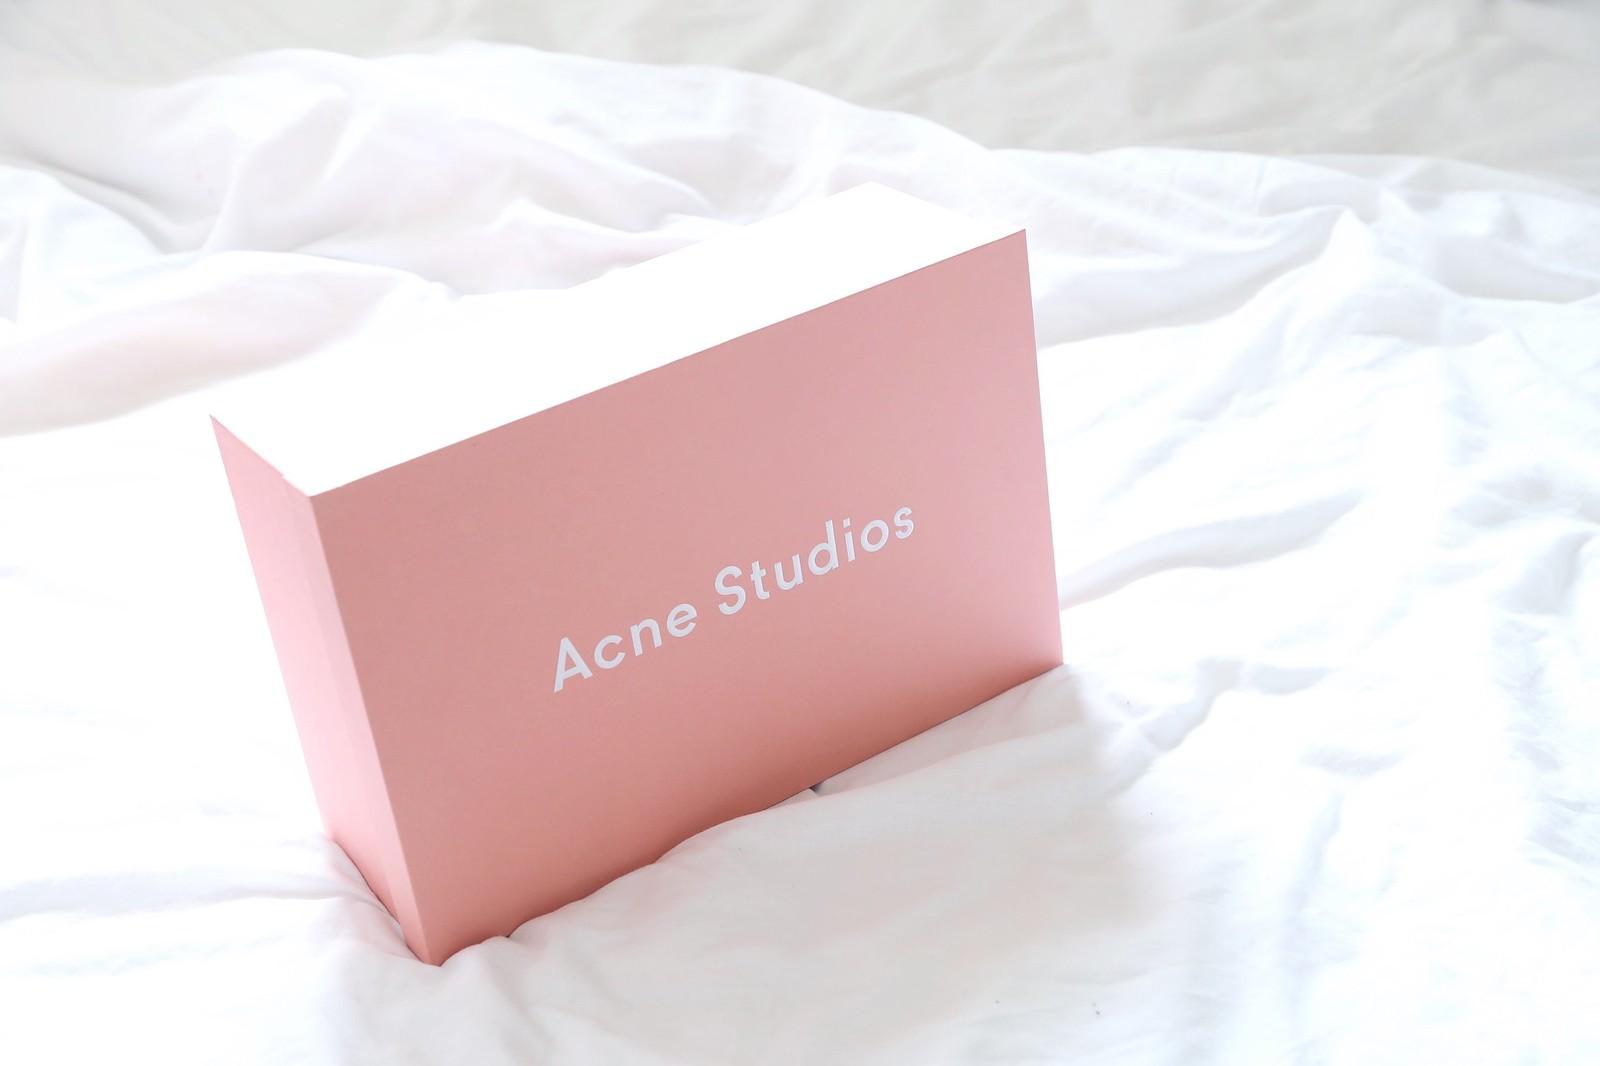 krystelcouture, acnestudios, acne, jensboots, acnestudiosshoebox,